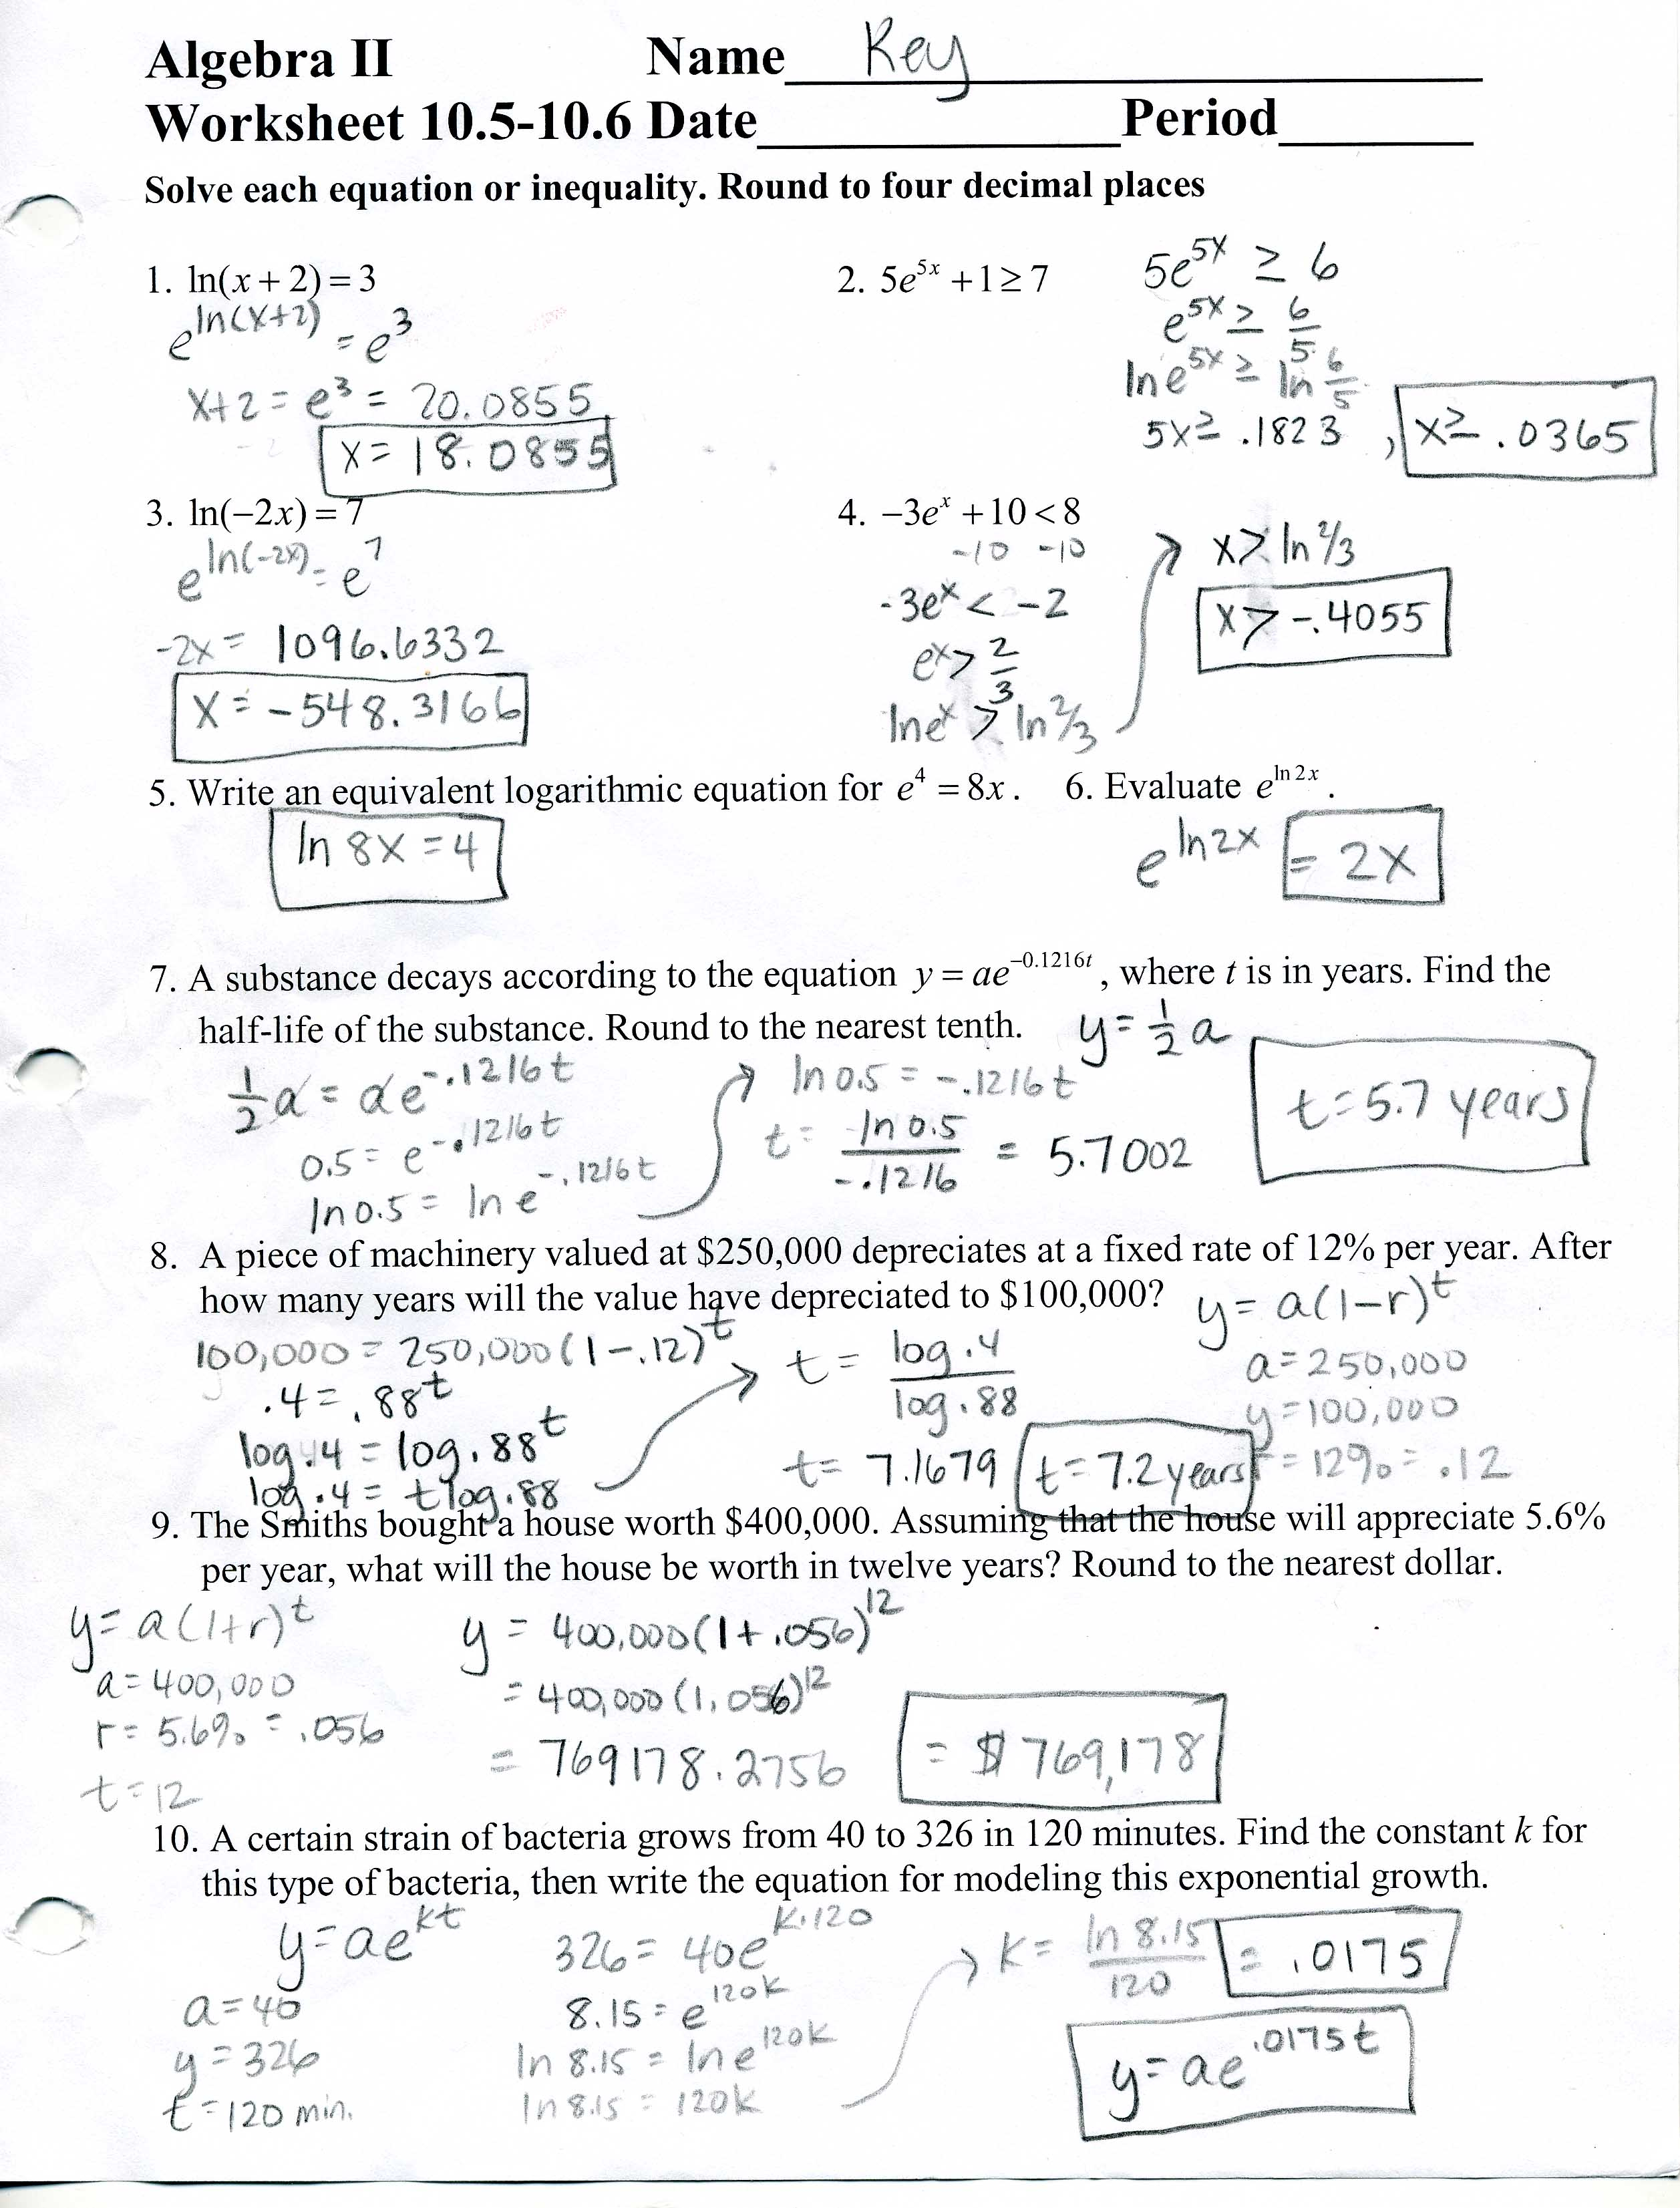 Worksheets Pearson Education Math Worksheets Answers pearson education worksheet answers algebra 2 intrepidpath glencoe math worksheets copyright 2010 education